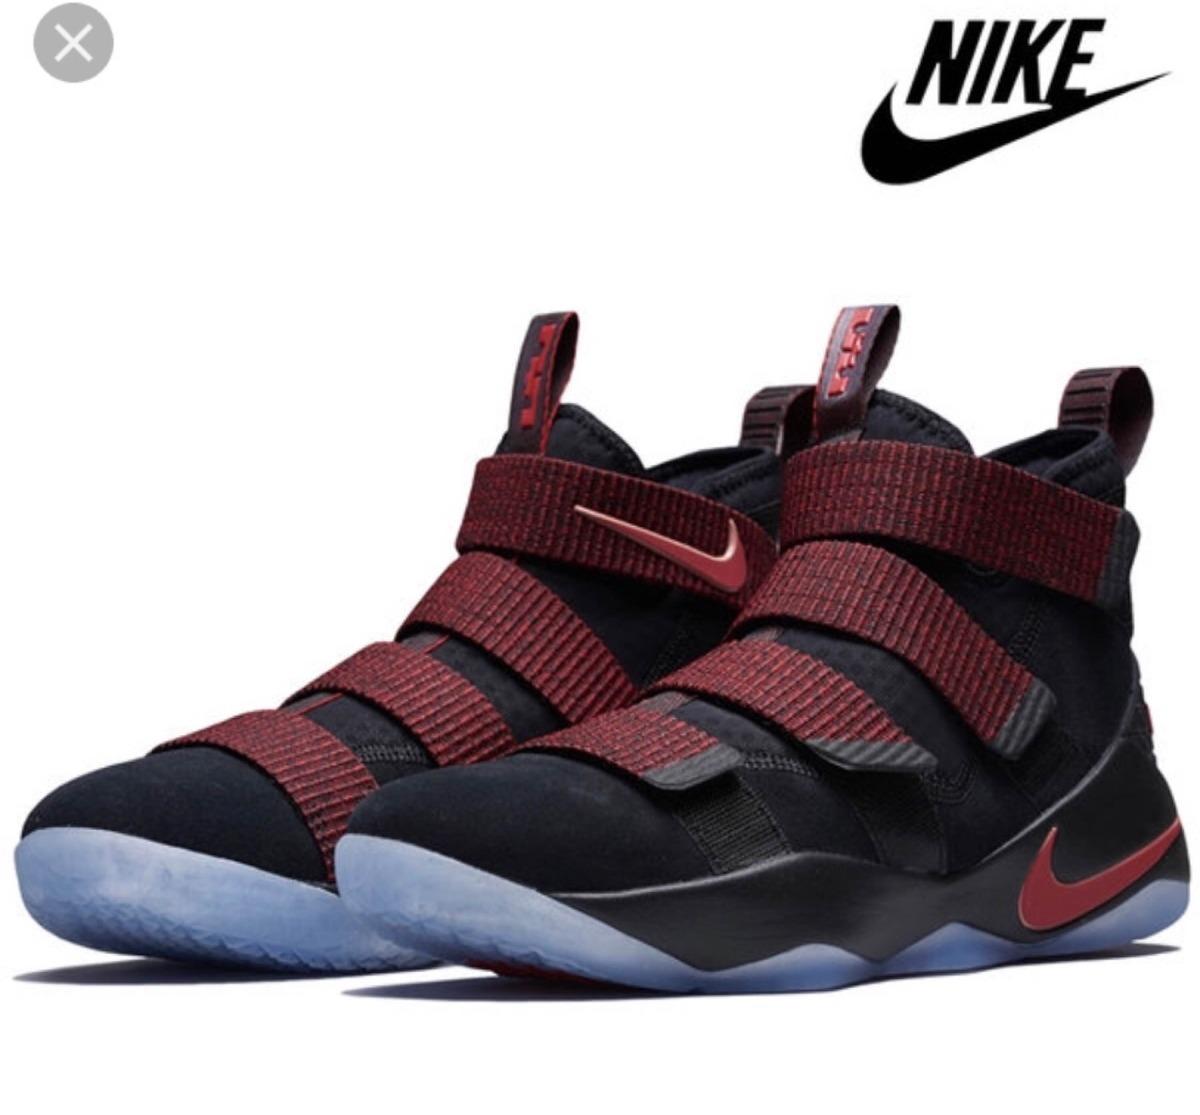 Nike Lebron James Soldier 5 Mx Envió Gratis 2 en